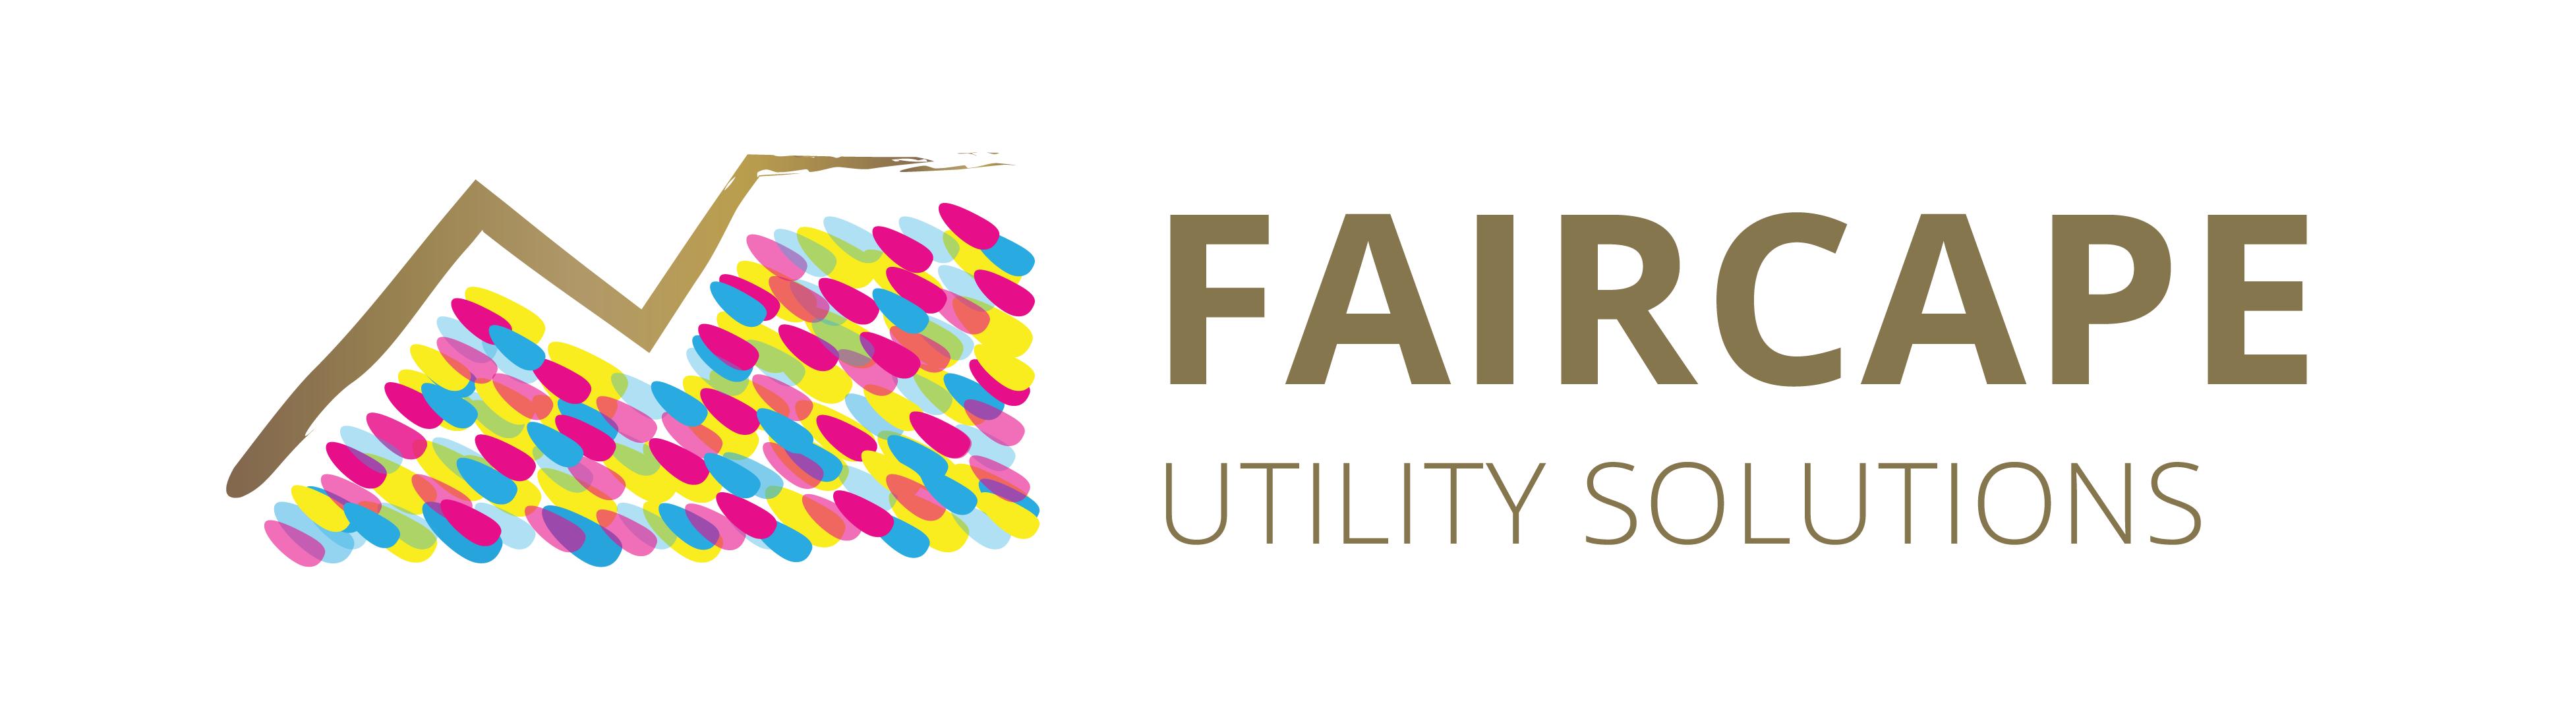 Faircape Utility Solutions